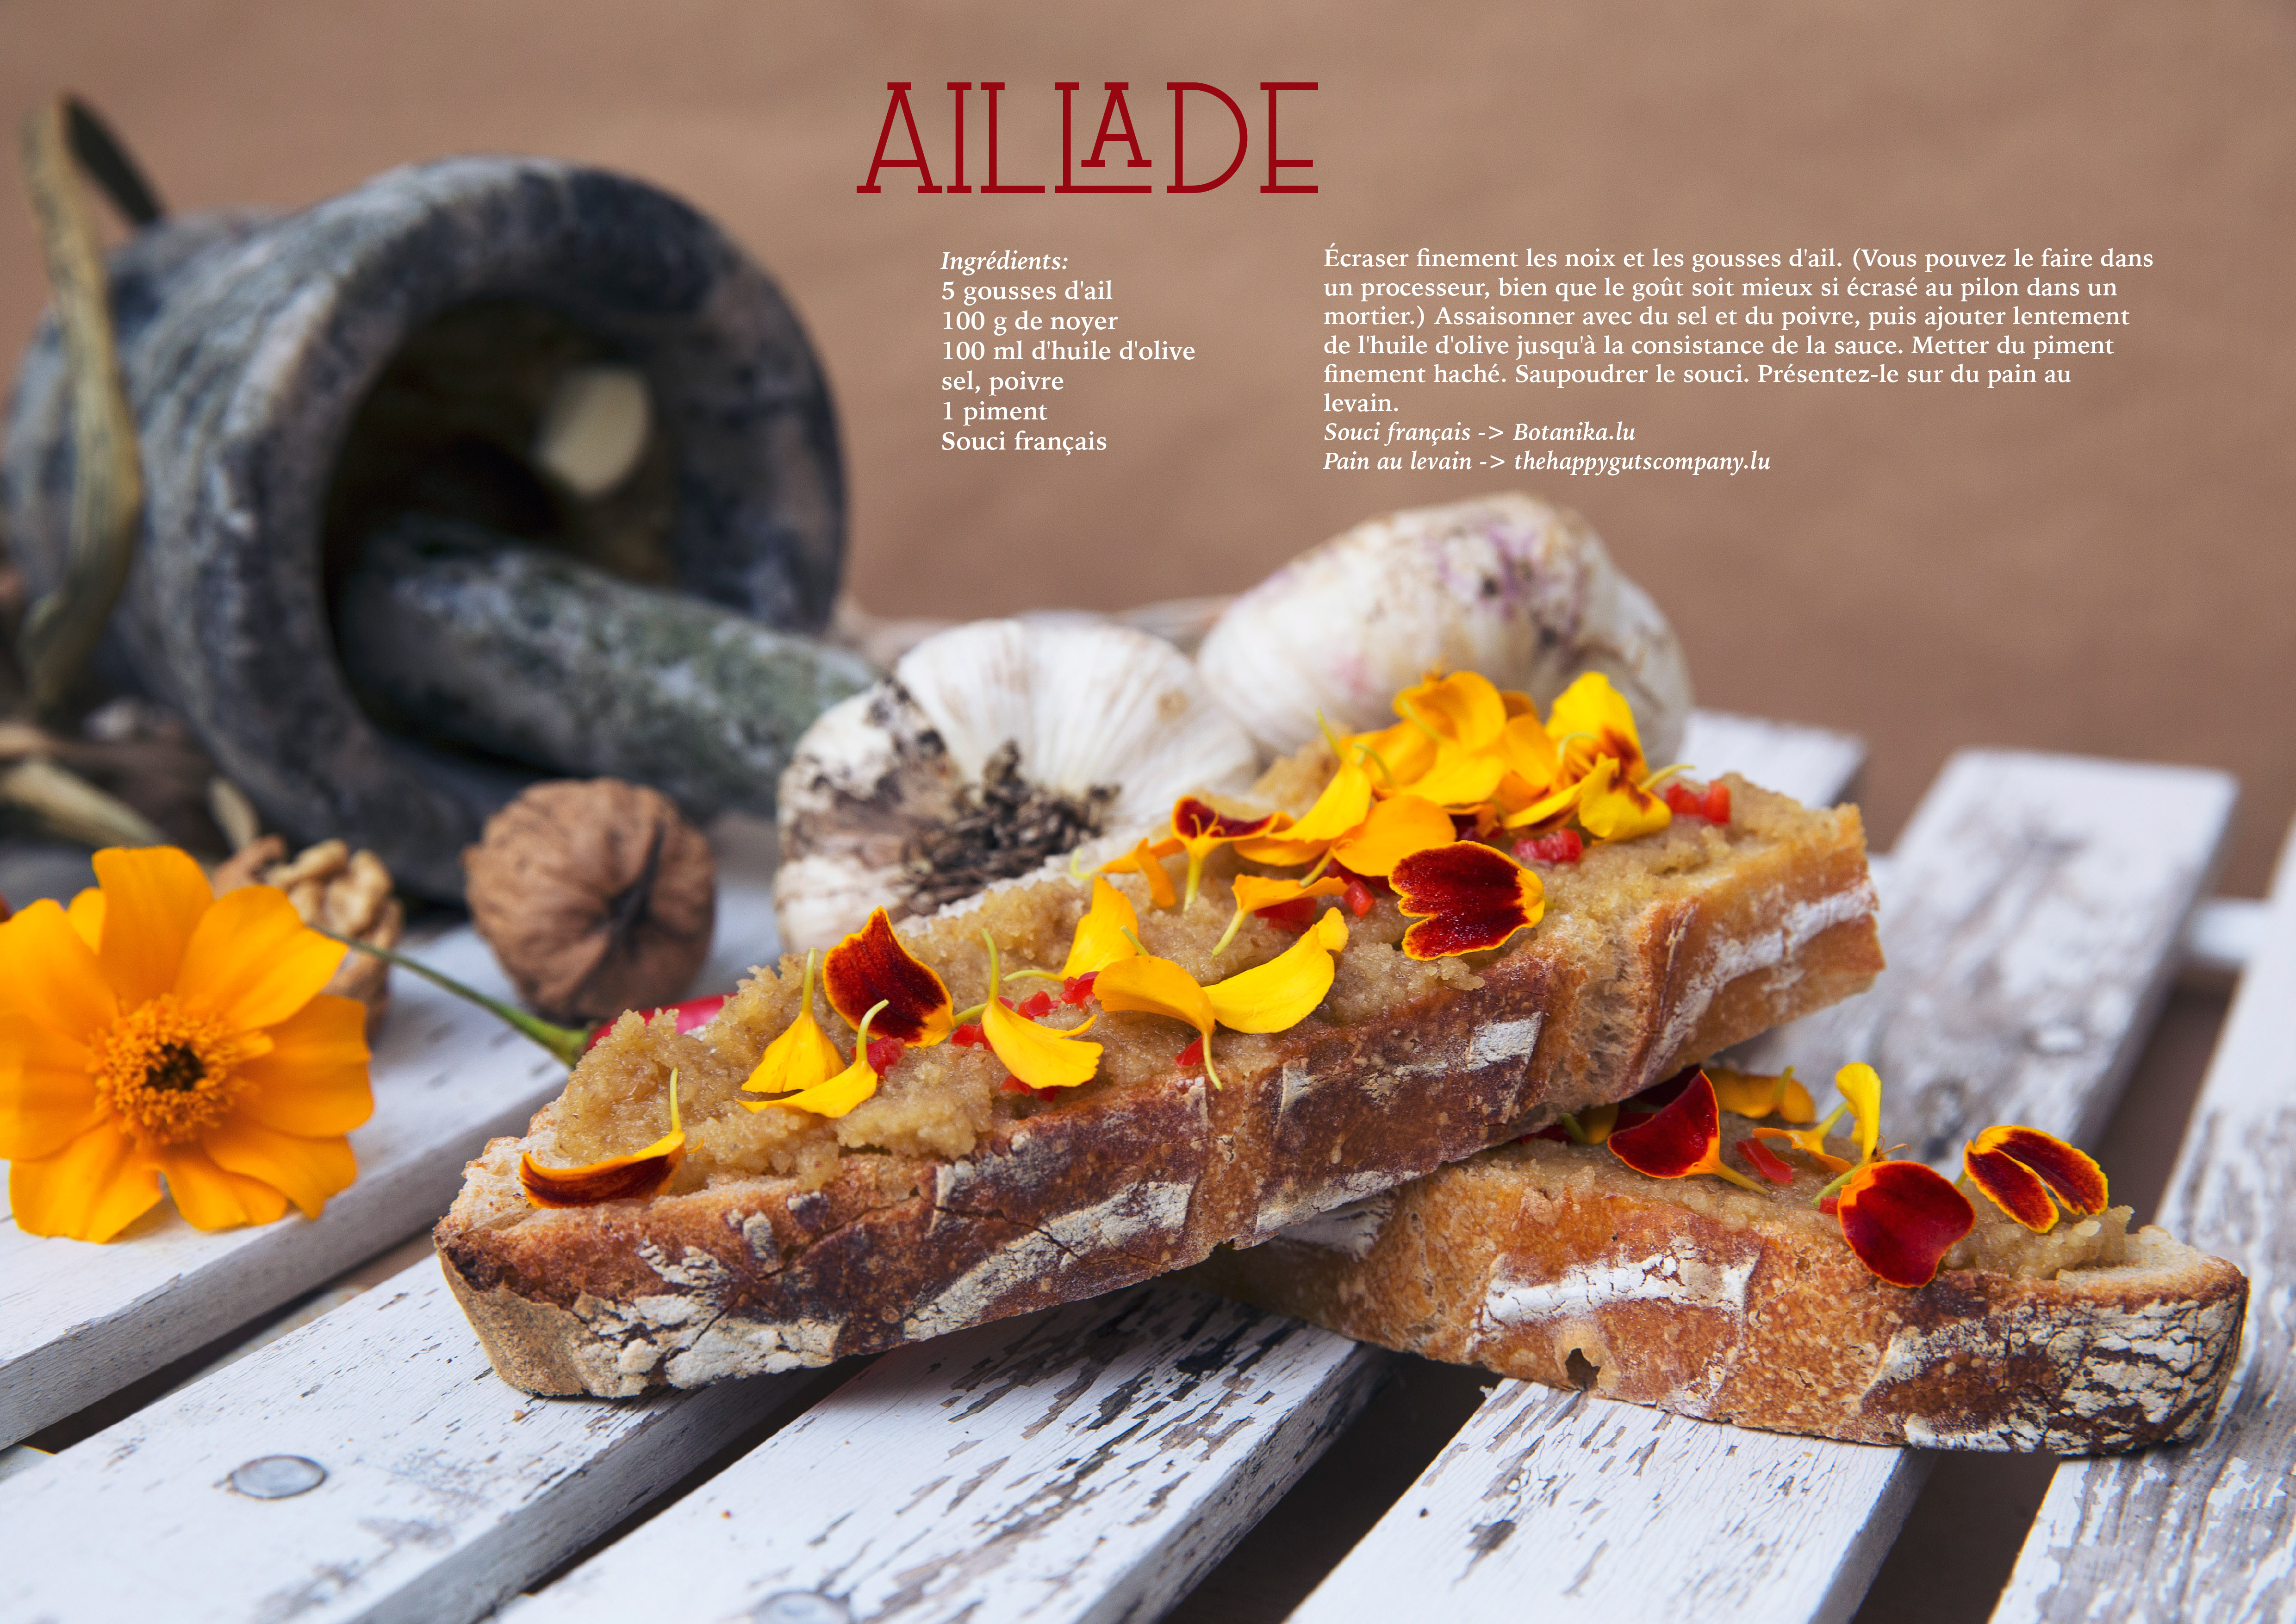 aillade_francais-01.jpg